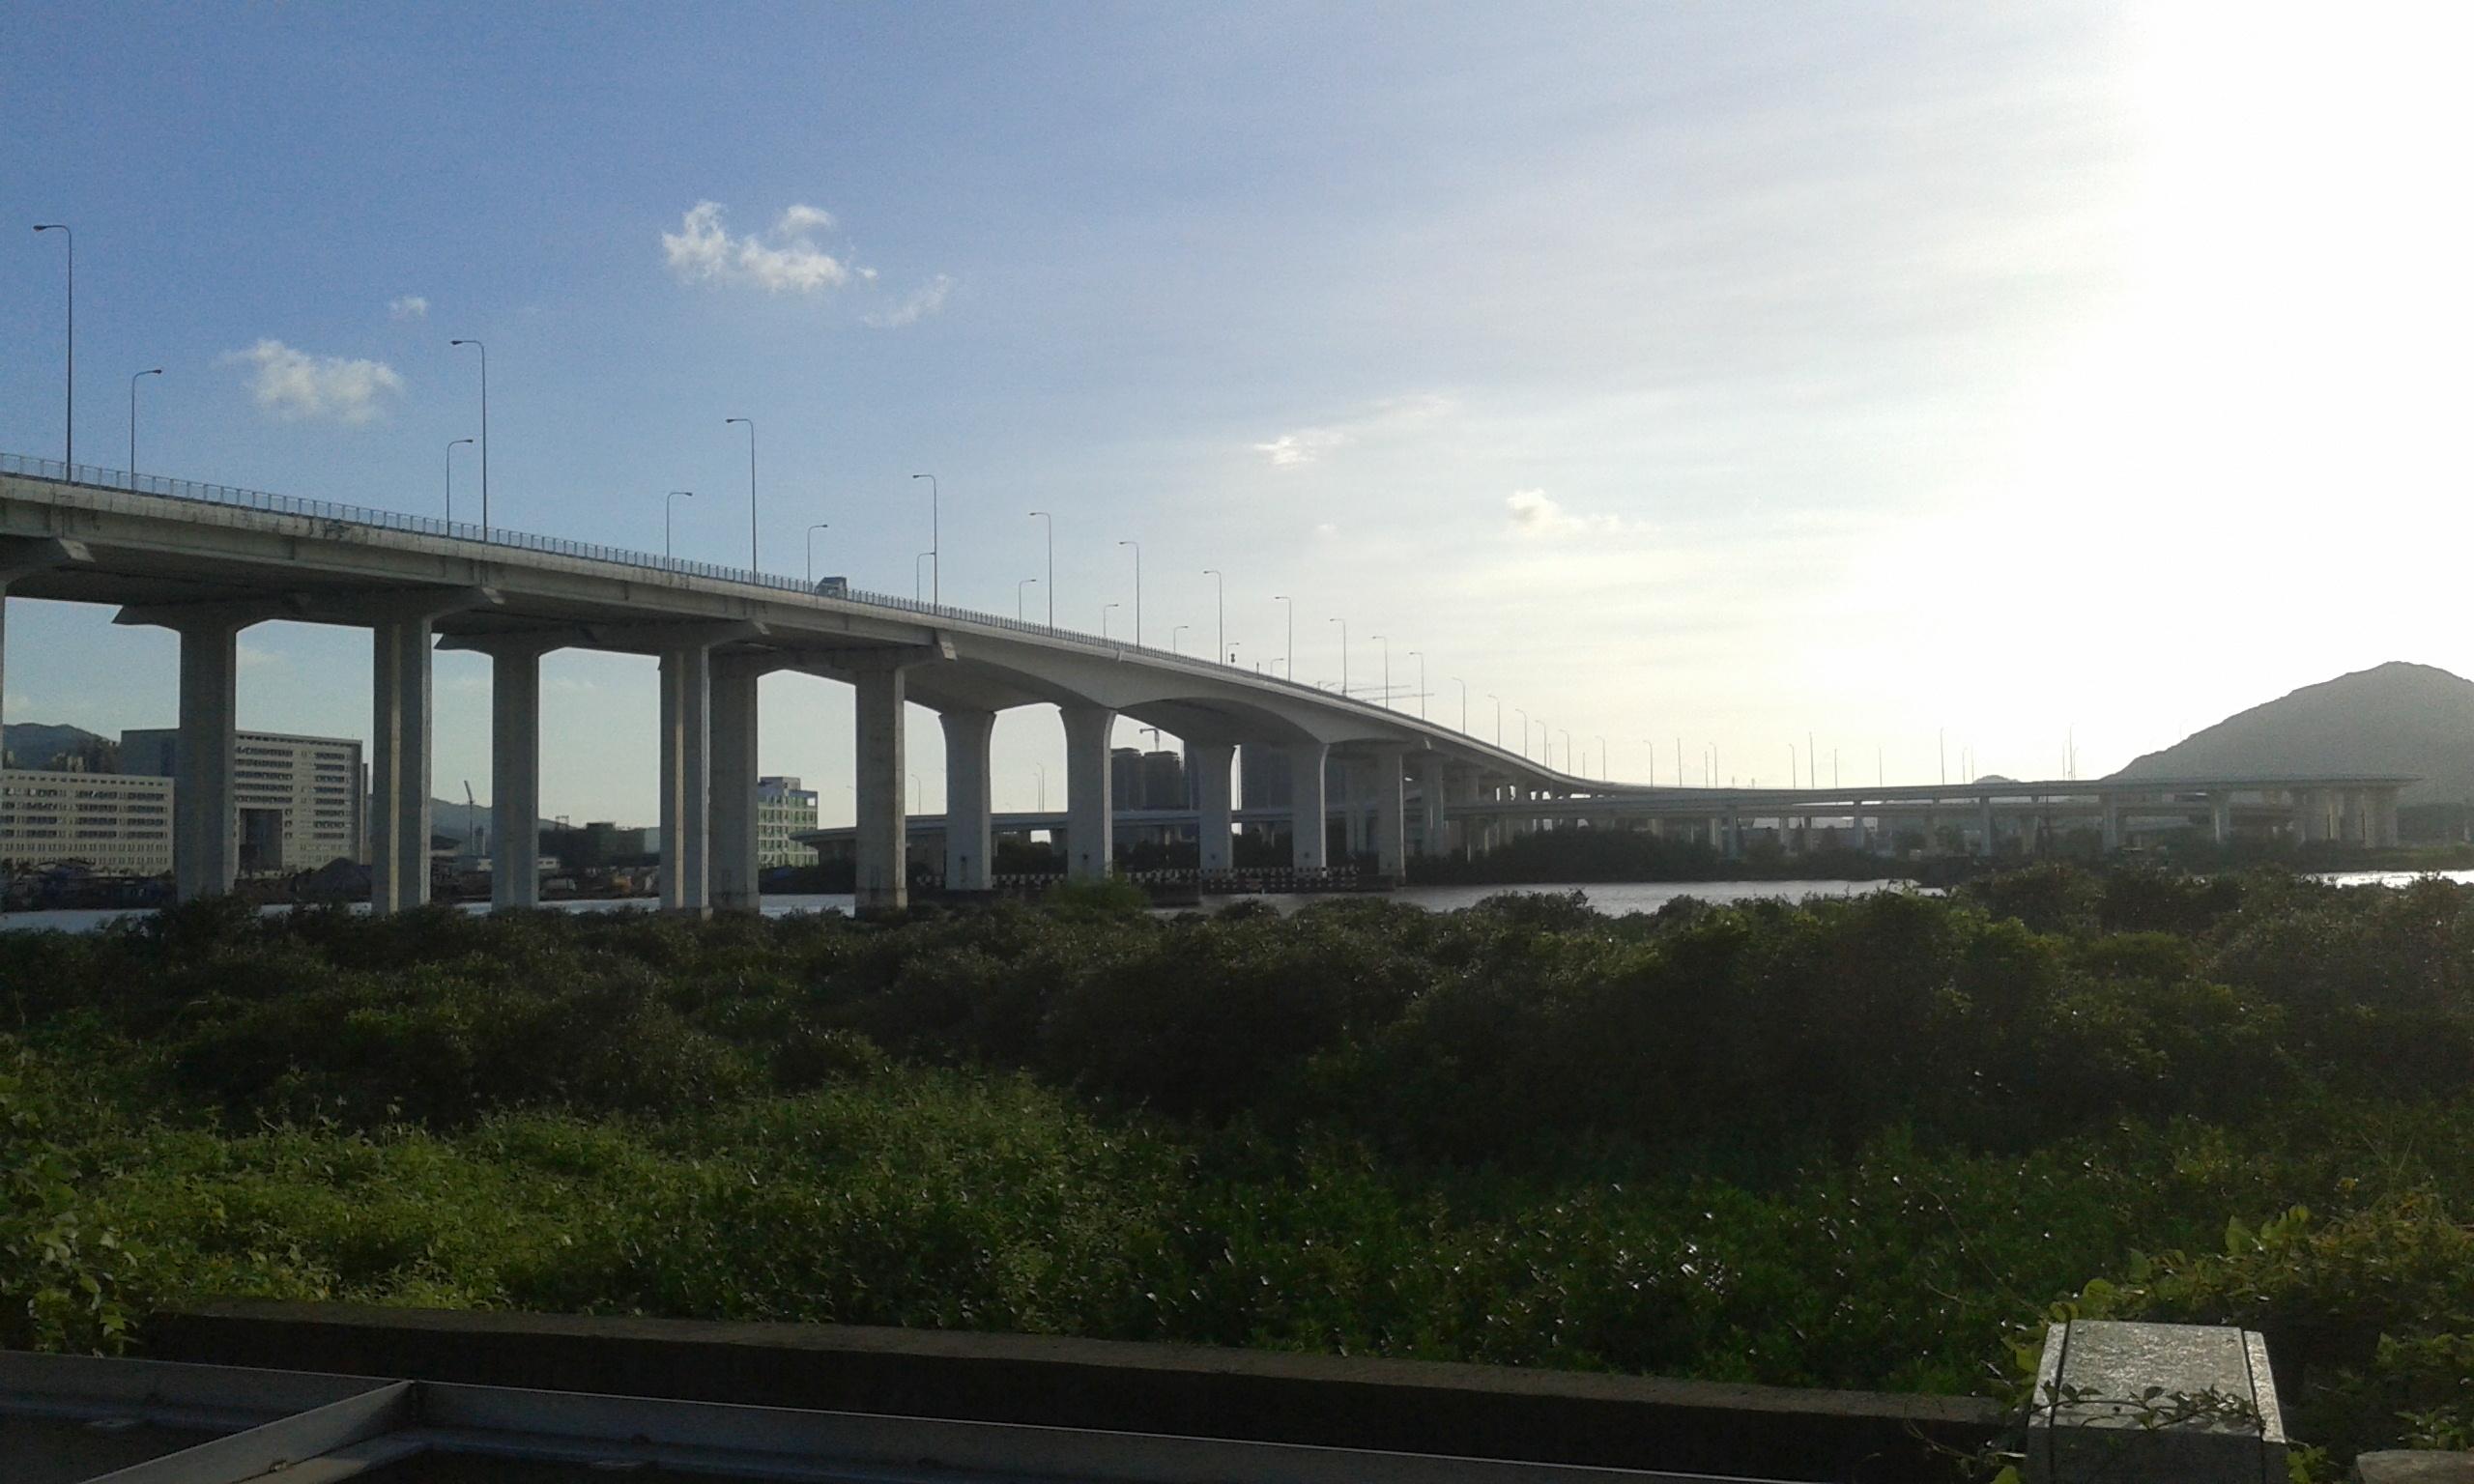 macau zhuhai border Ponte Flor de Lótus